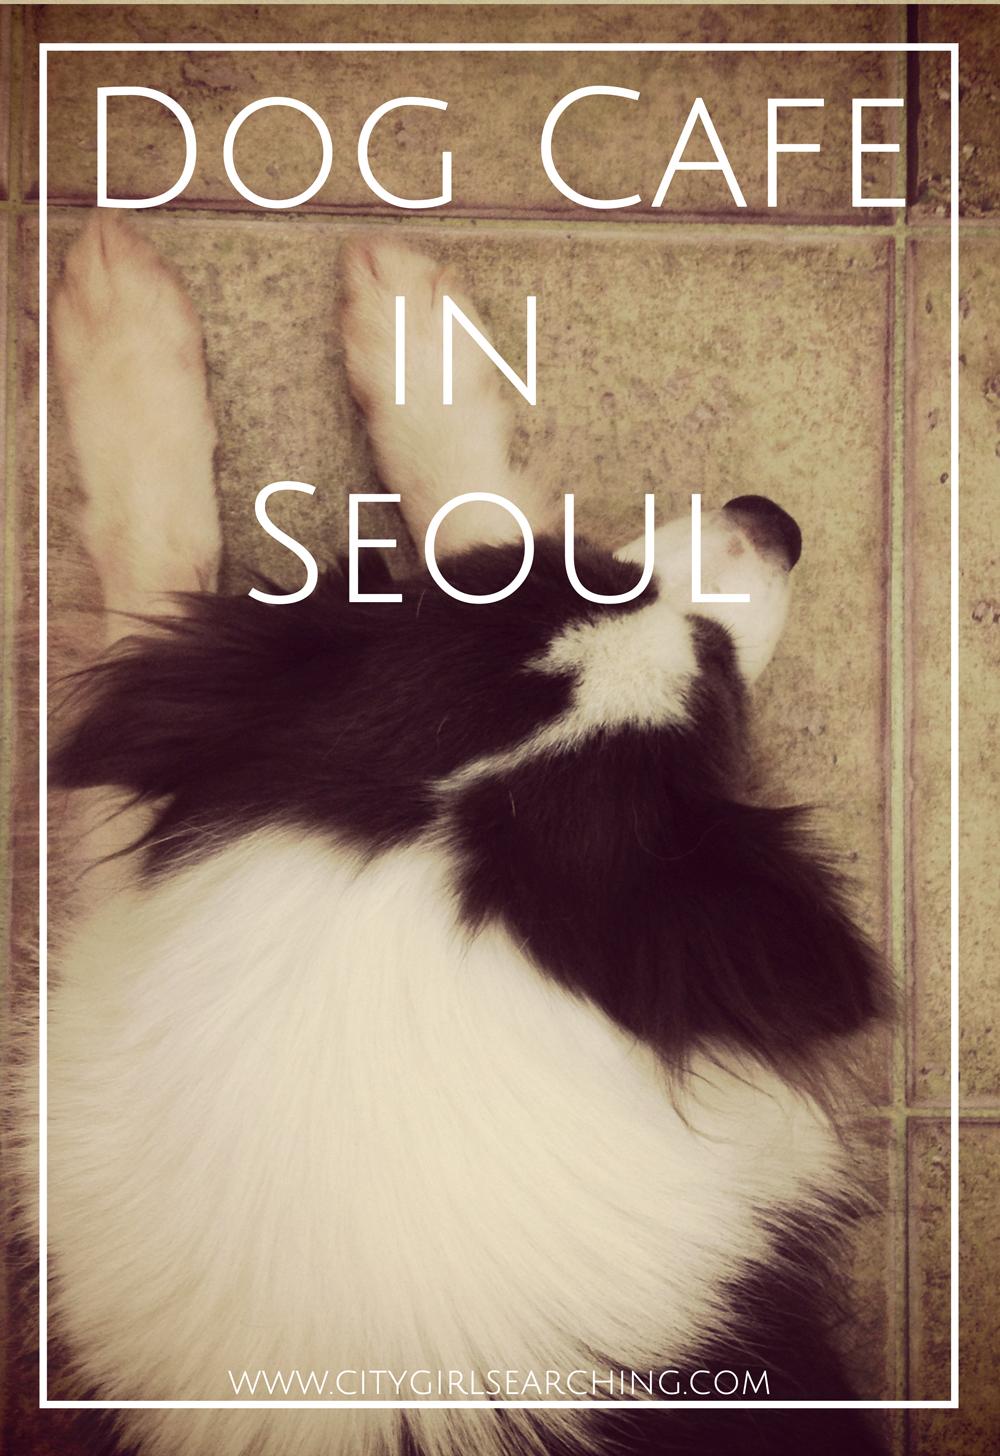 Dog cafe in seoul South Korea